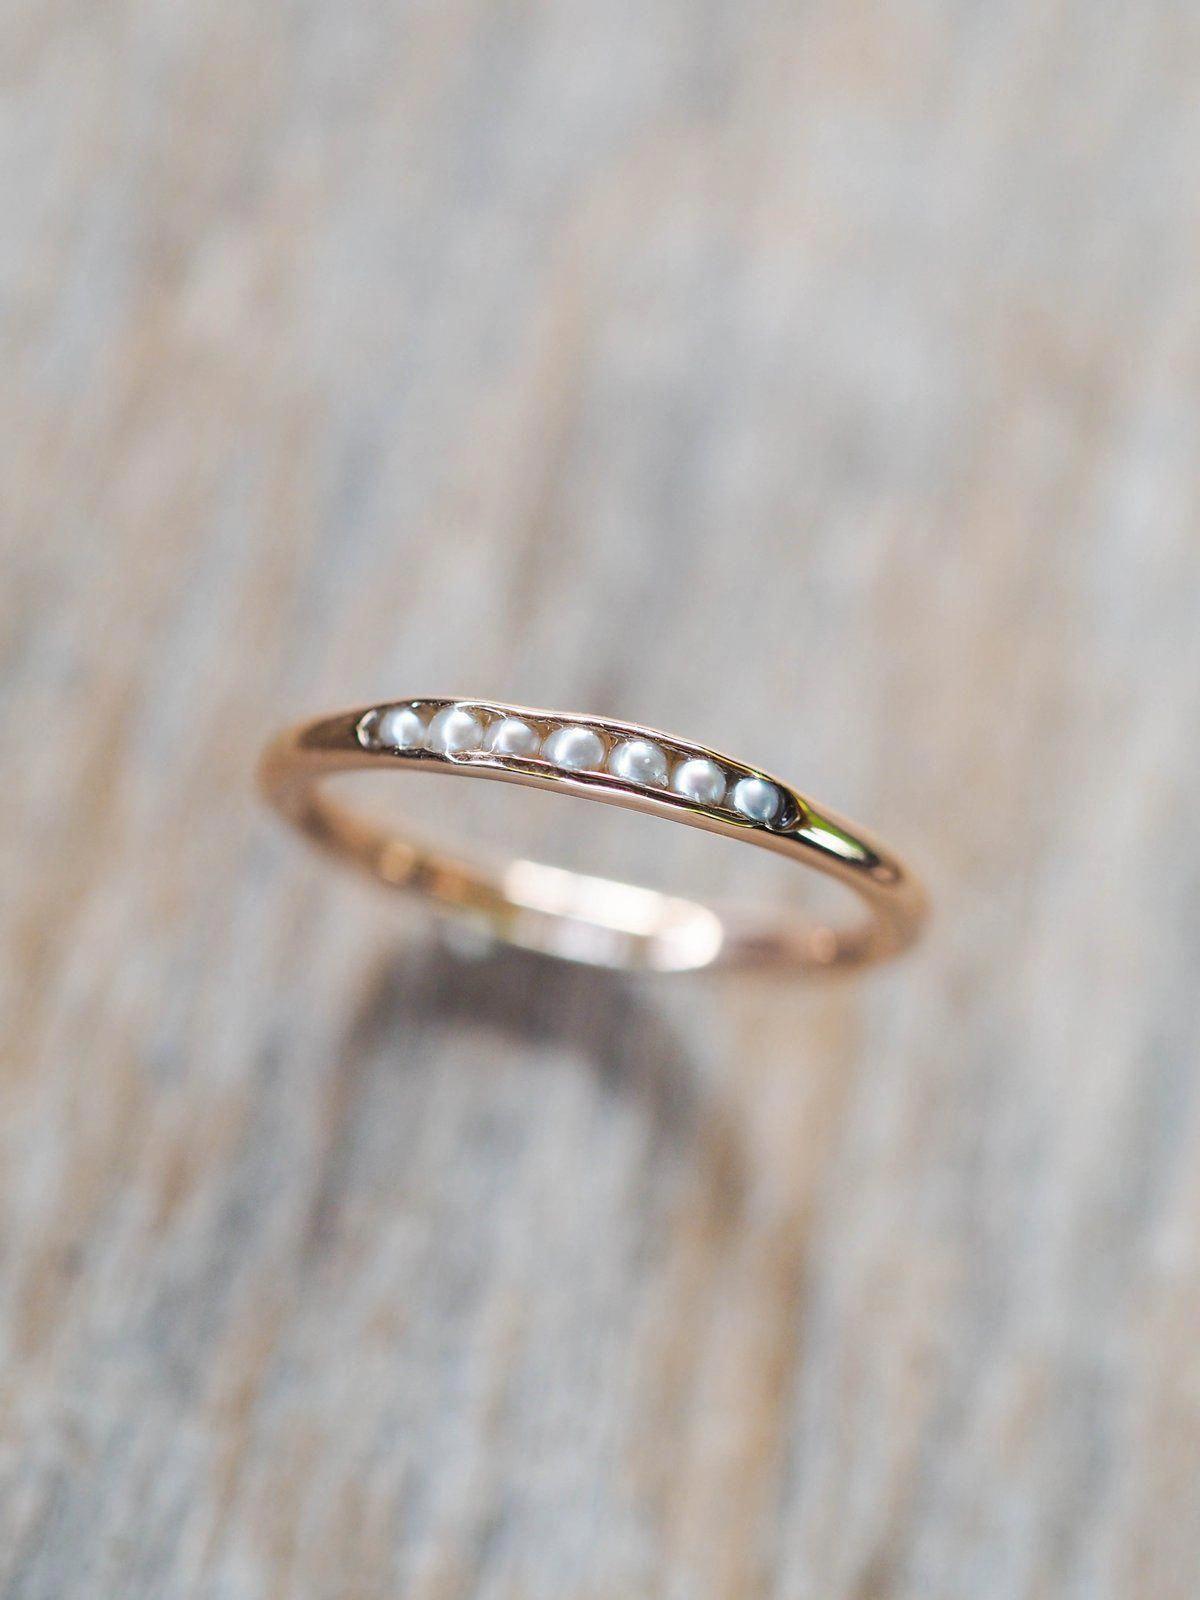 Moonstone engagement ring white gold vintage engagement